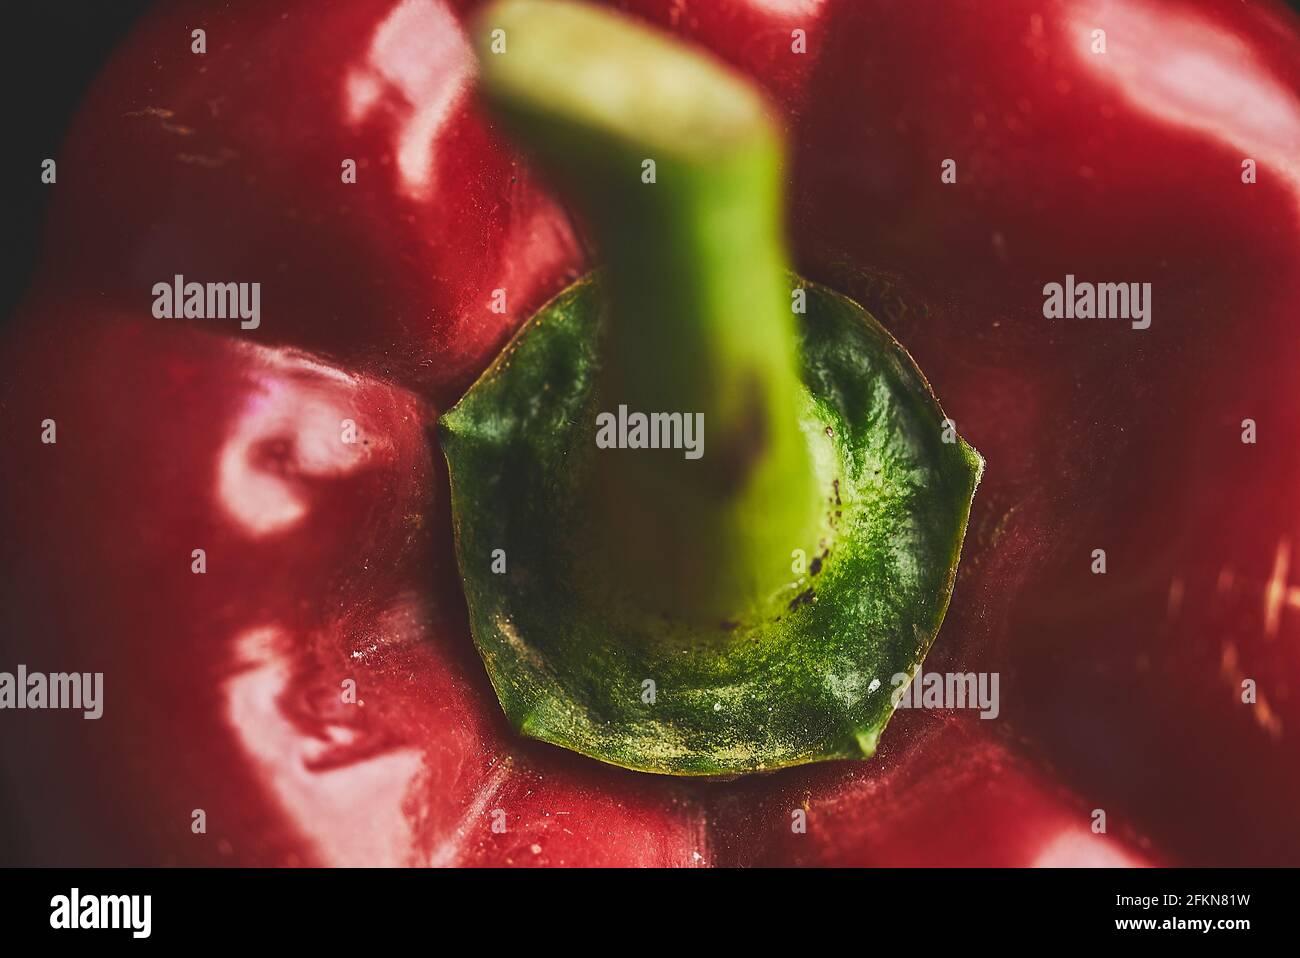 Macro primer plano de un pimiento rojo fresco fondo oscuro Foto de stock